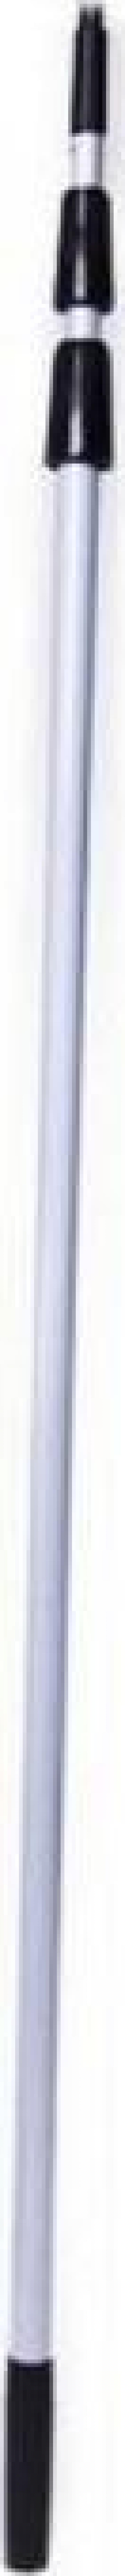 Coada aluminiu telescopica 4,5 m